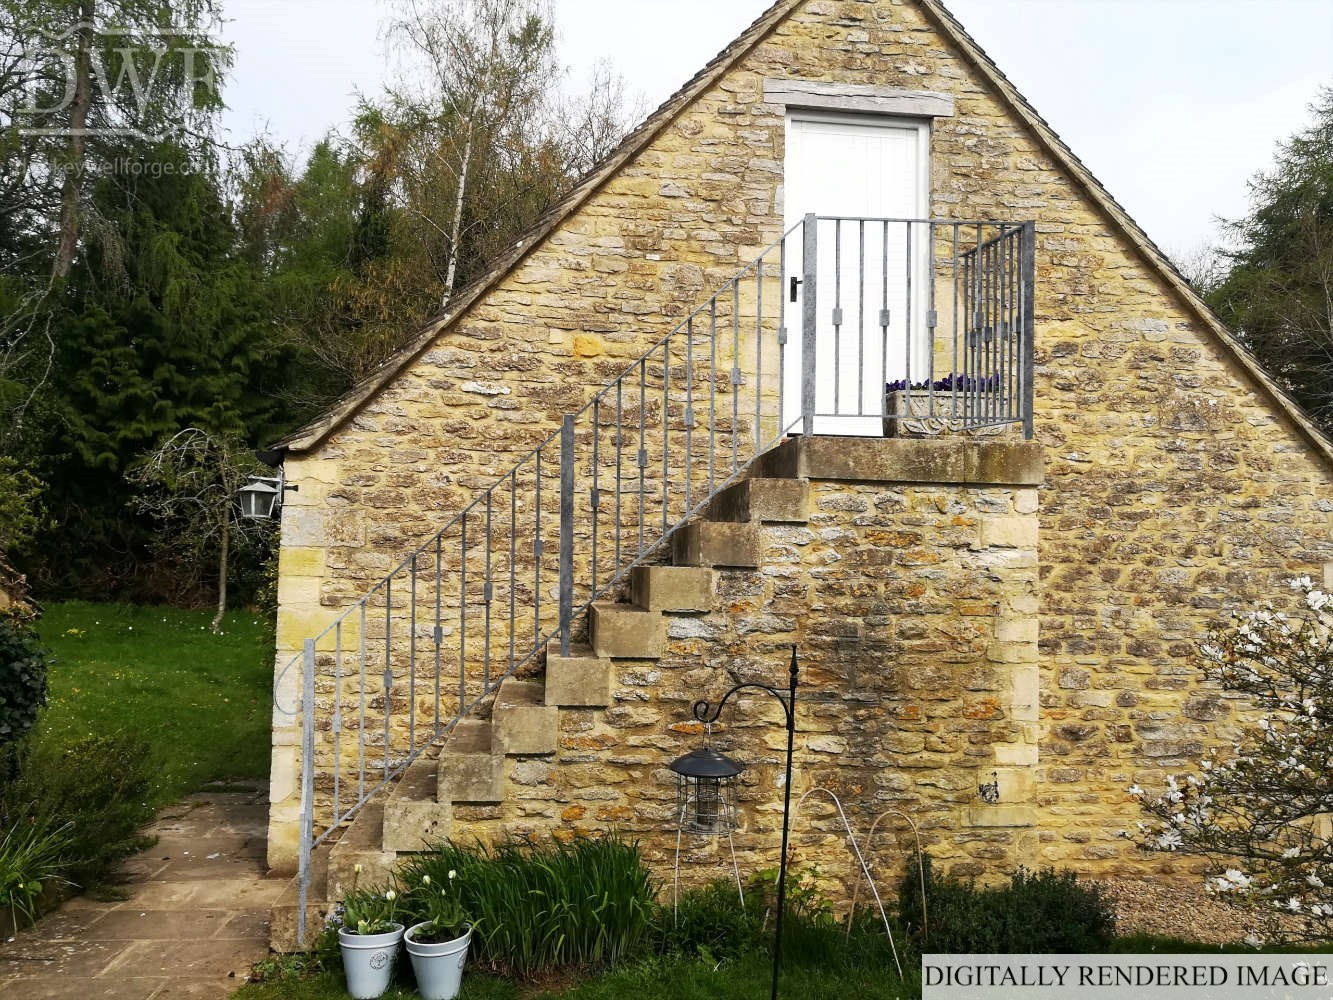 digitally-rendered-traditional-ironwork-tallet-stair-handrail